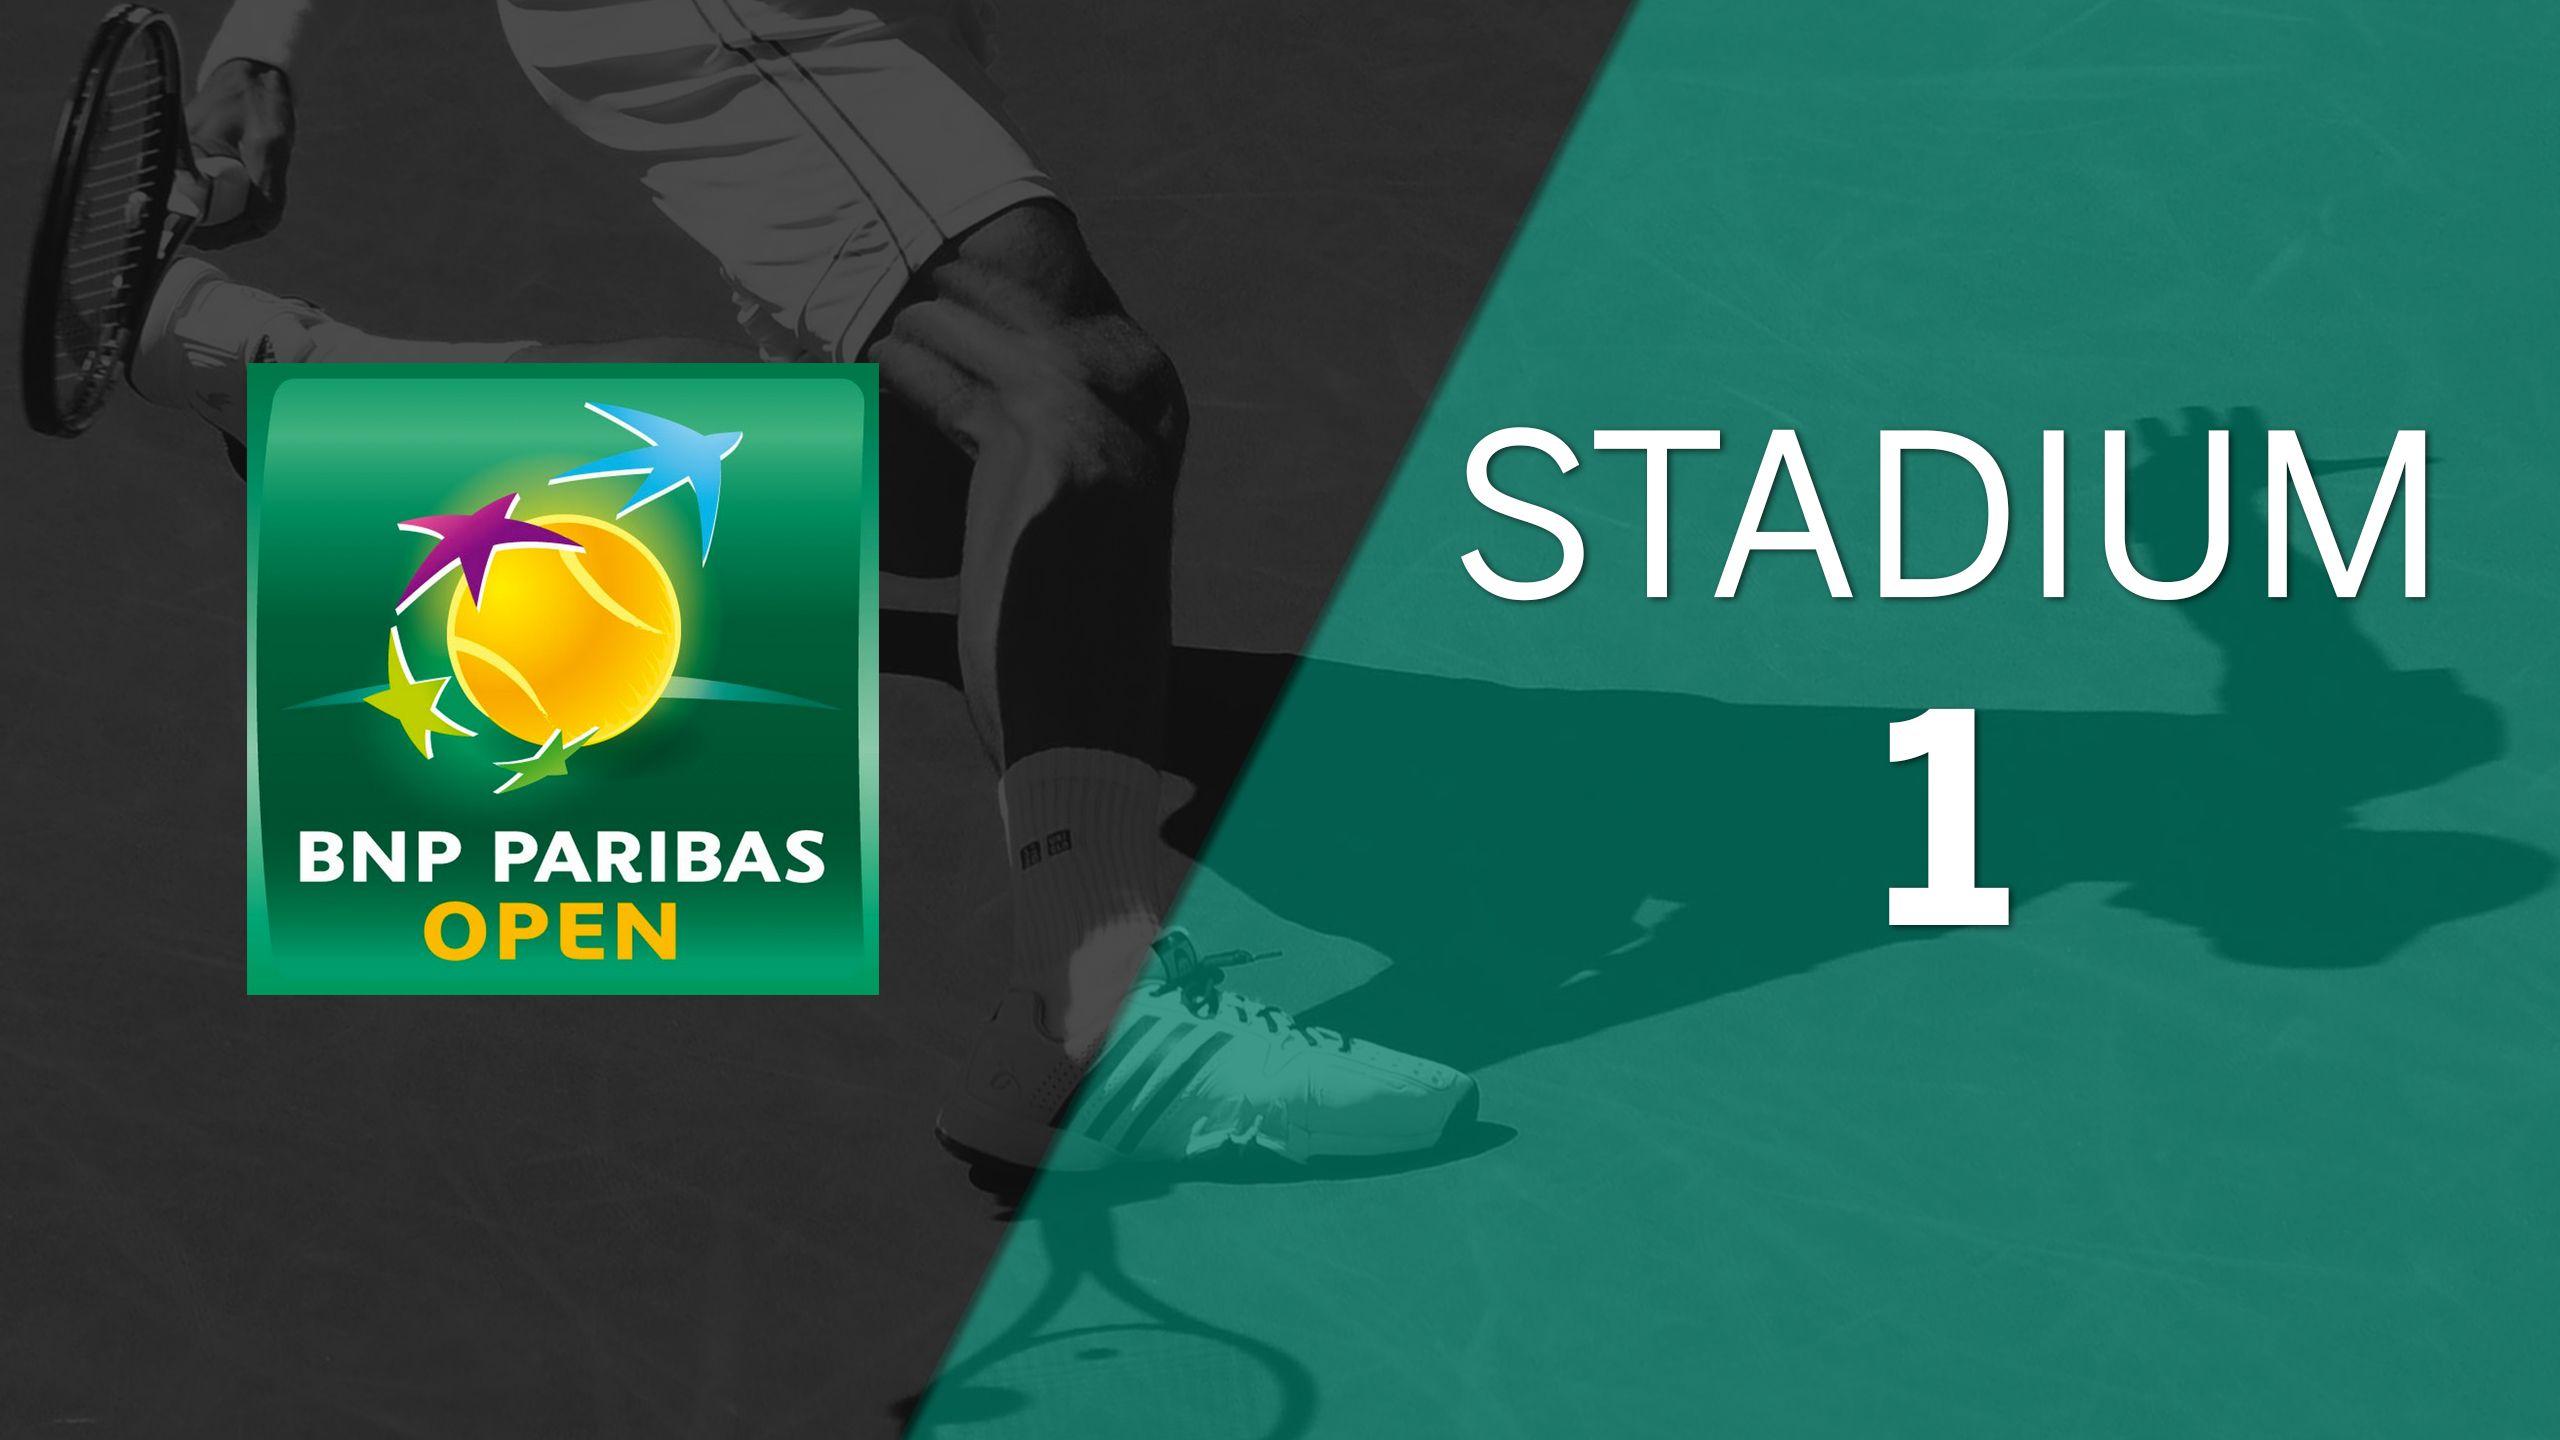 BNP Paribas Open - Stadium 1 (Third Round)